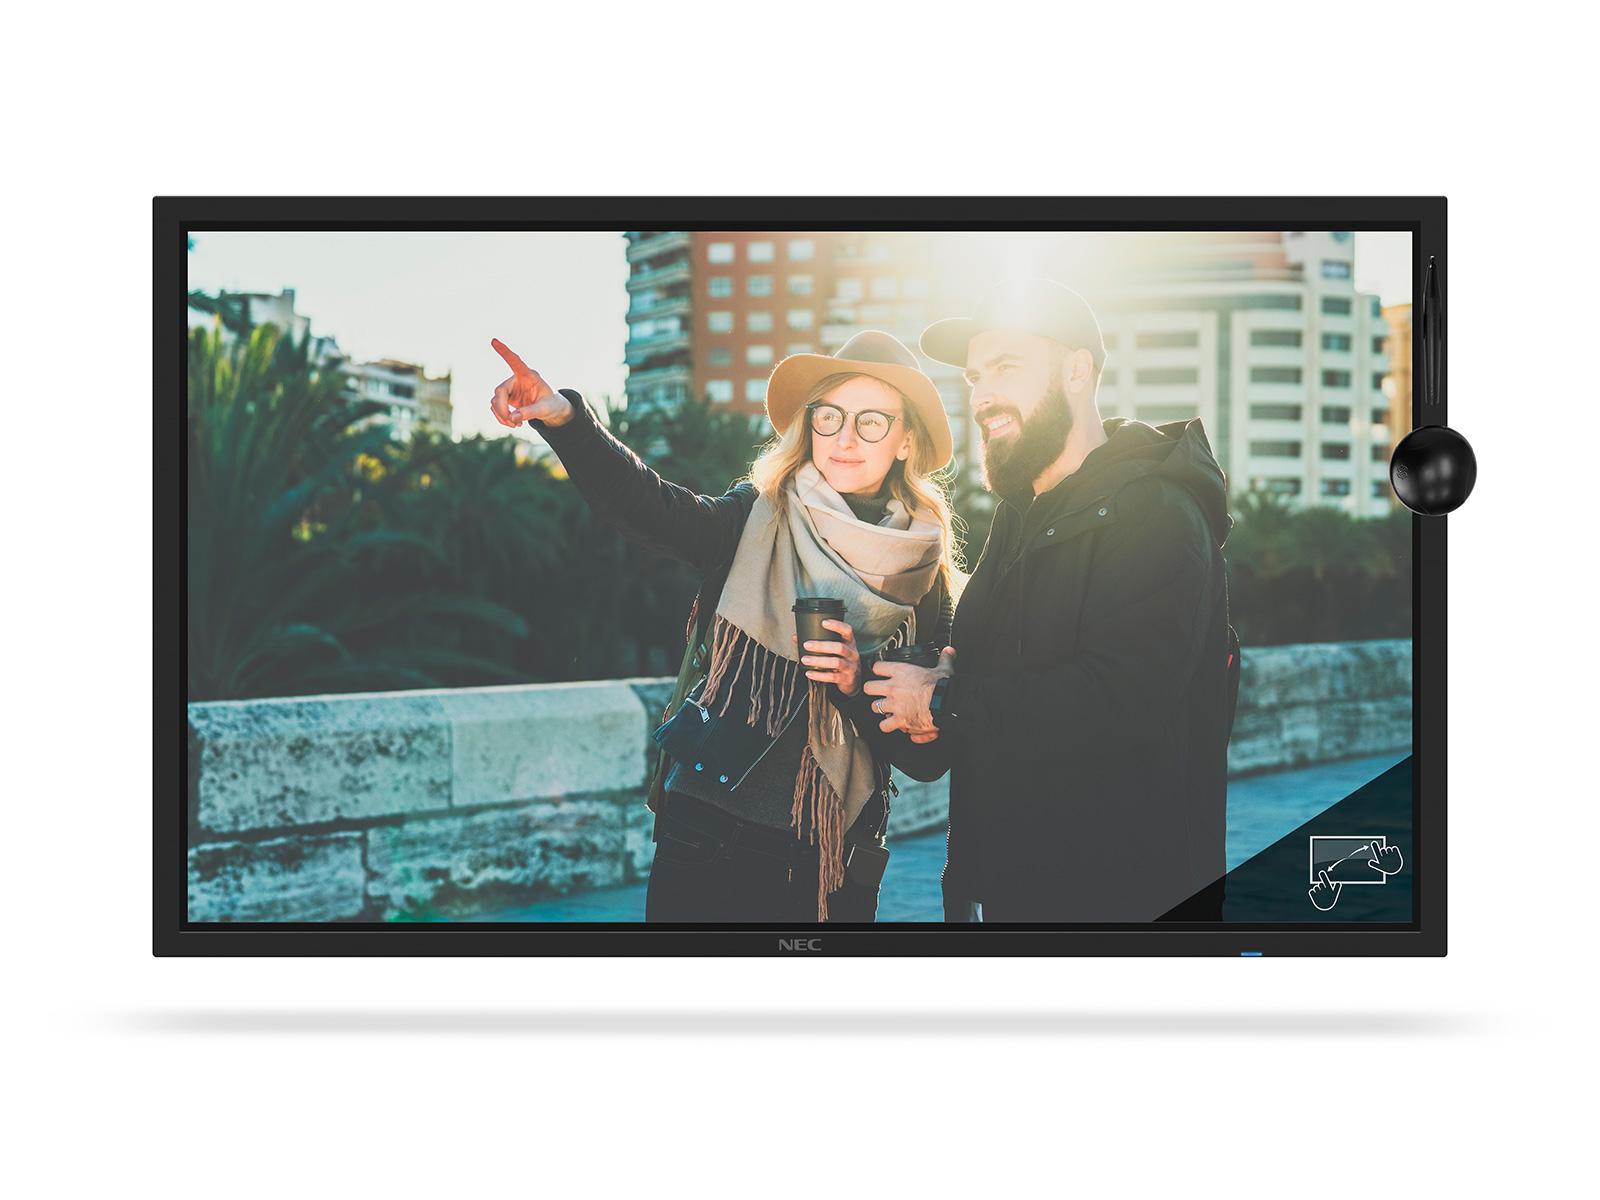 Large Format Display - Multisync C861q Sst (shadowsense) - 86in - 3840x2160 (uhd) - Black